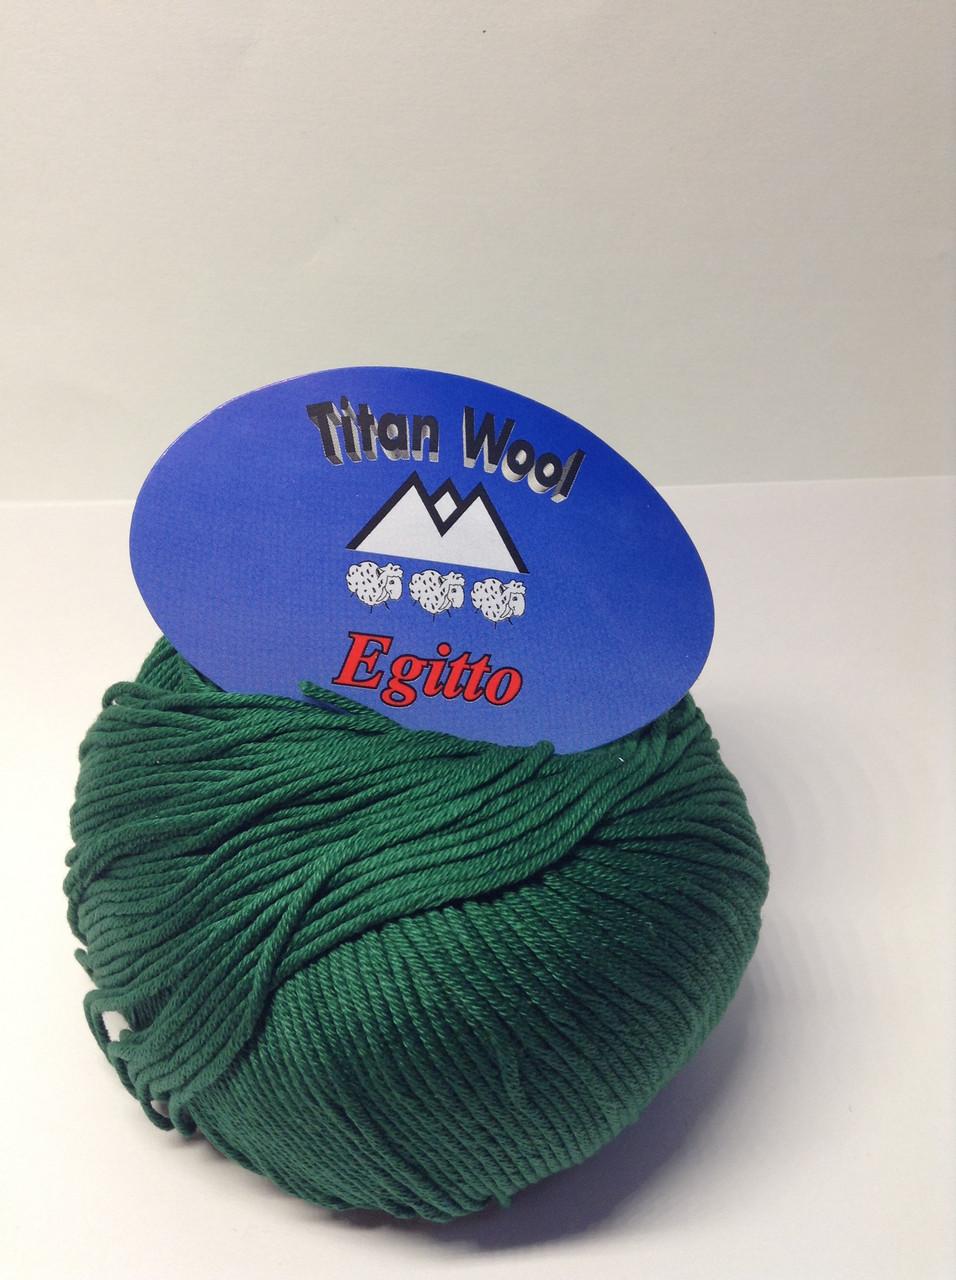 Пряжа Egitto Titan wool Италия (100% хлопок)